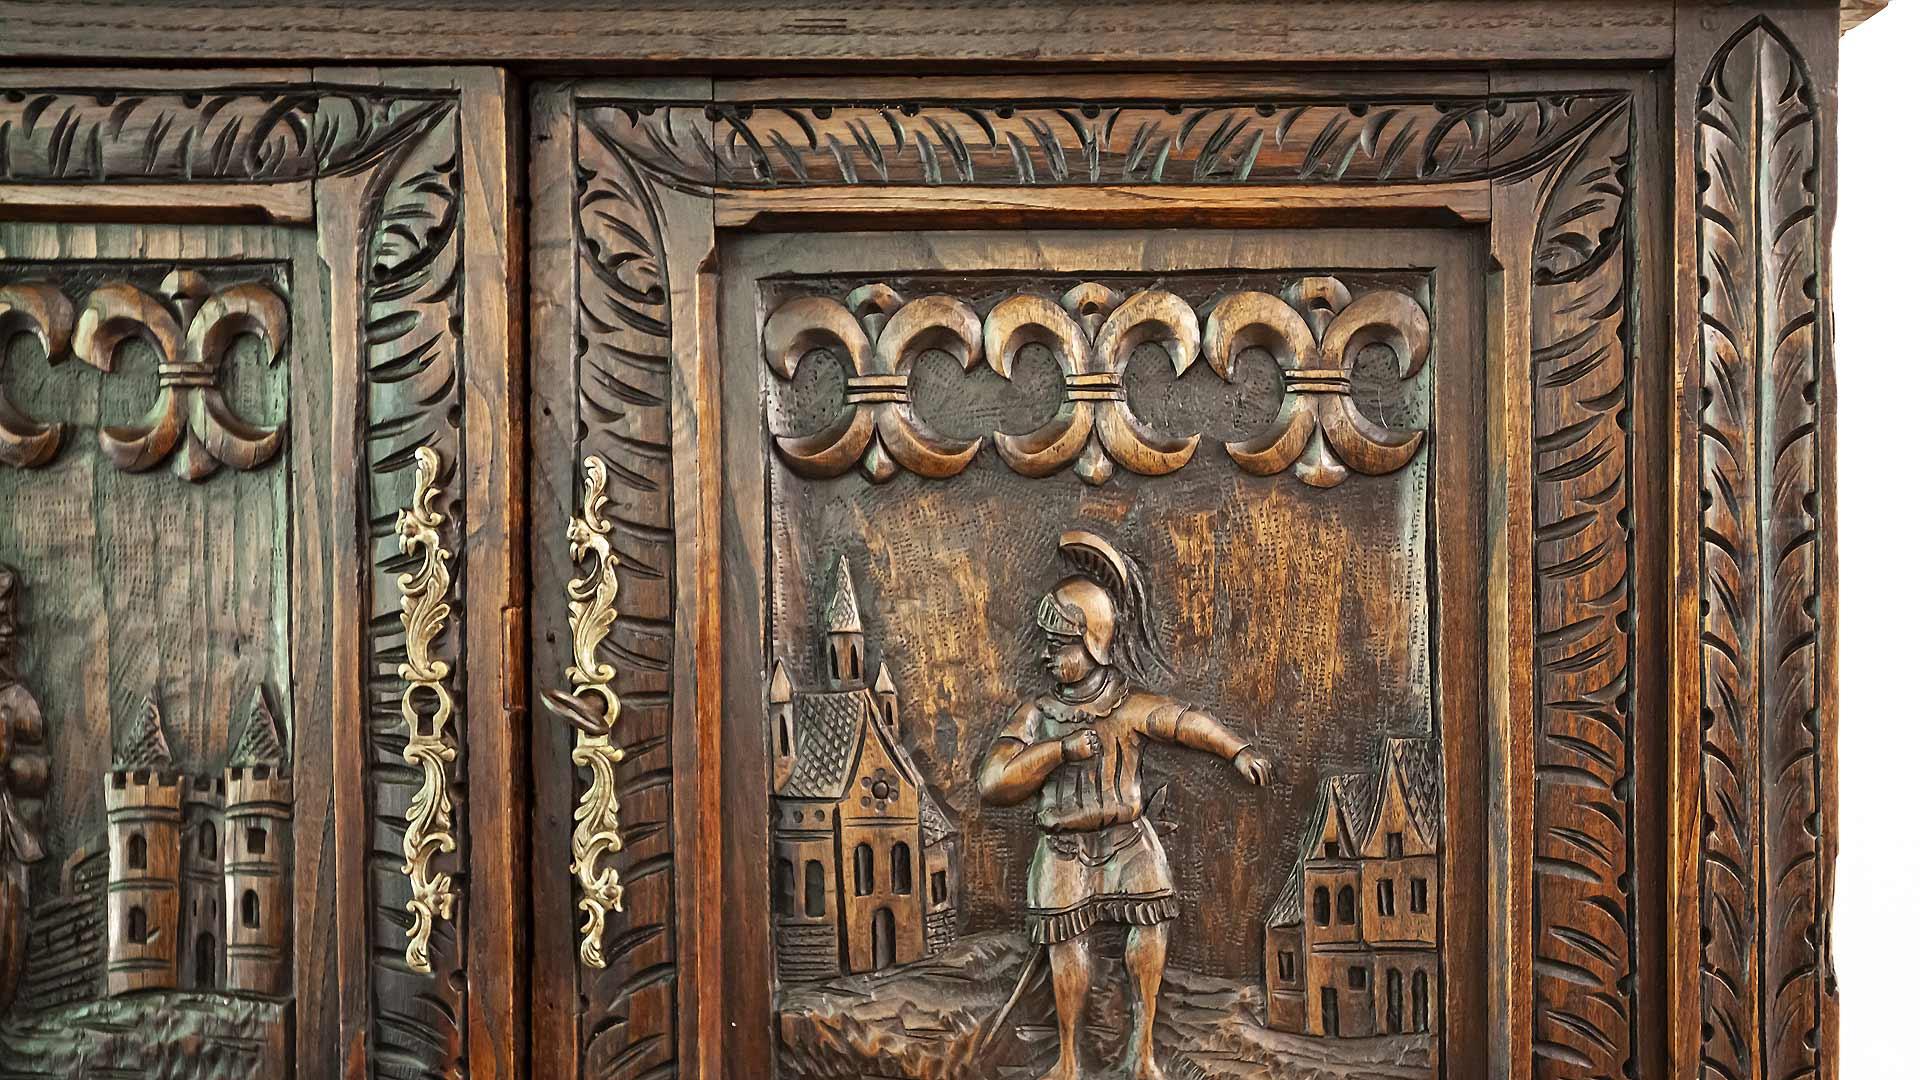 European antique accommodates dry bar function - Bridge House - Fenneville, Michigan - Lake Michigan - HAUS | Architecture For Modern Lifestyles, Christopher Short, Indianapolis Architect, Tom Rigney, TR Builders - Saugatuck, Michigan - Douglas, Michigan